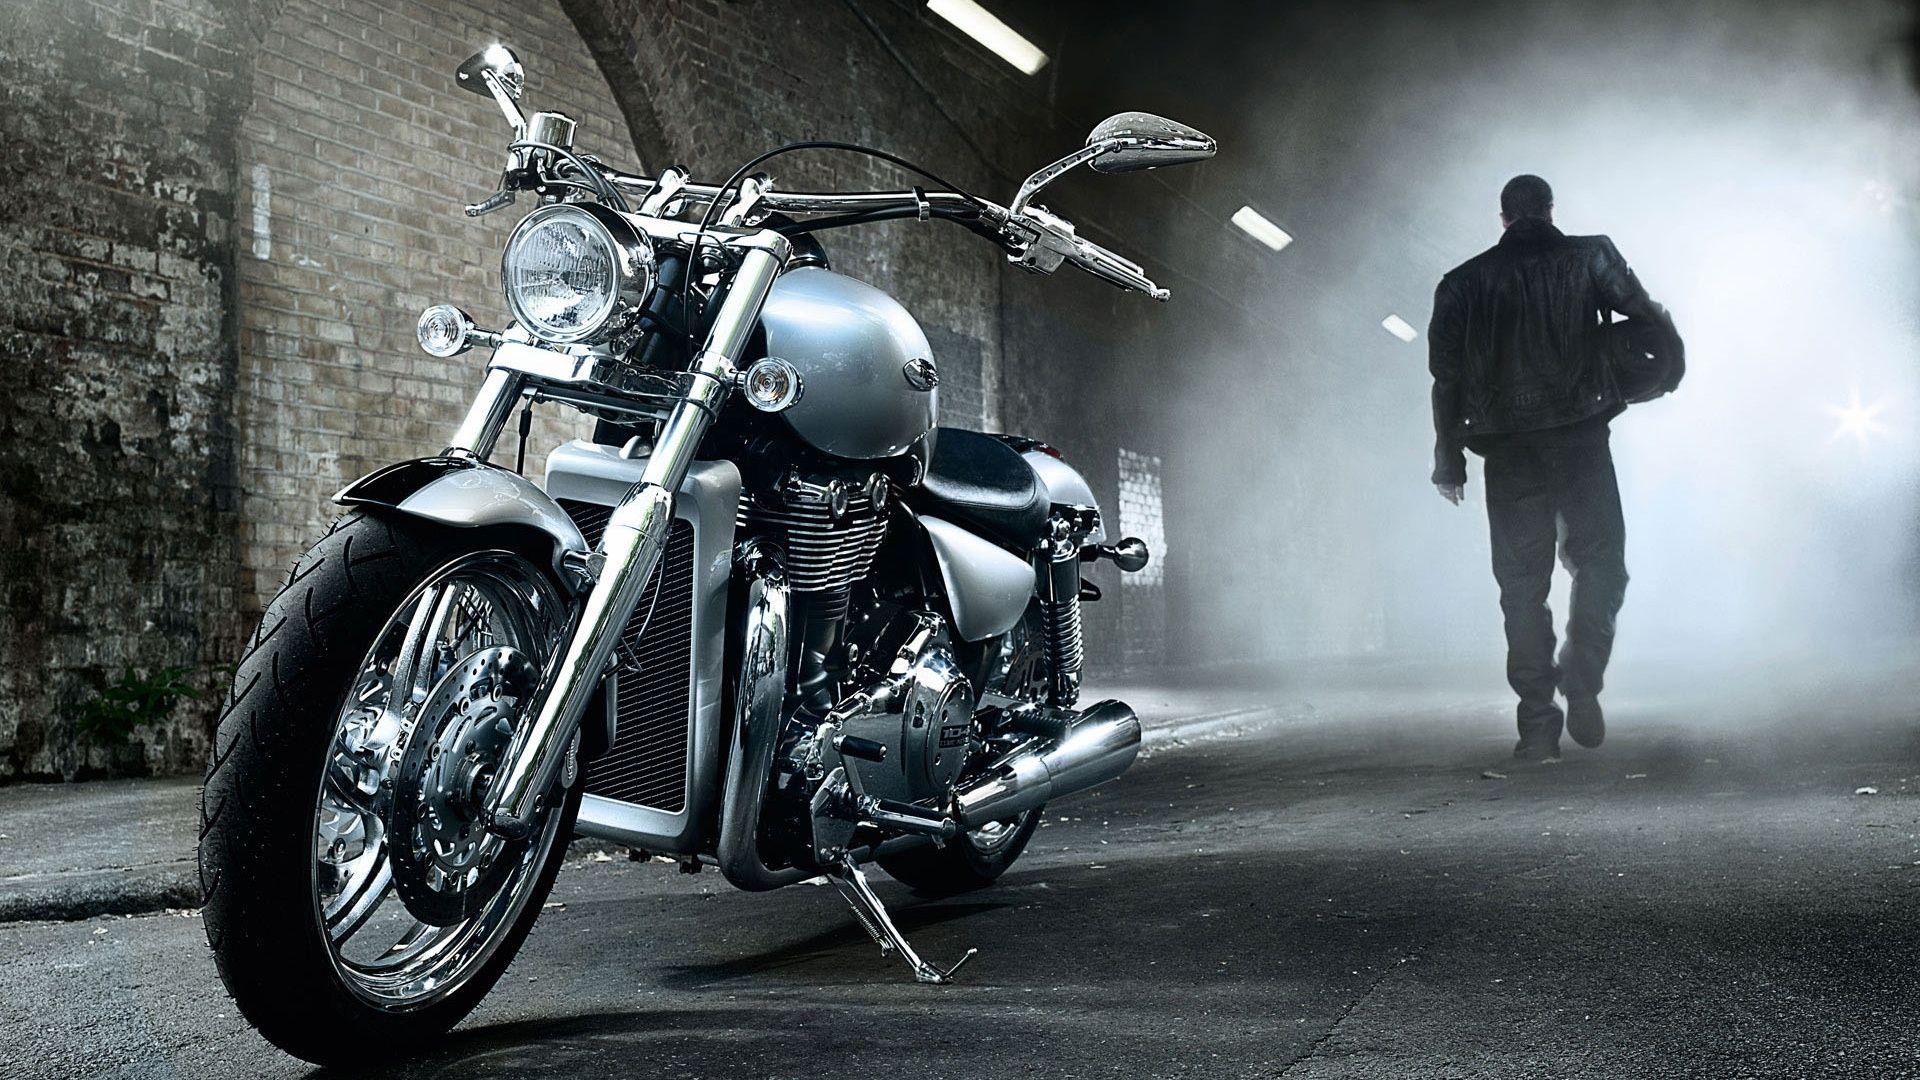 Trouver la moto anglaise a vendre - Trouver la moto anglaise a vendre